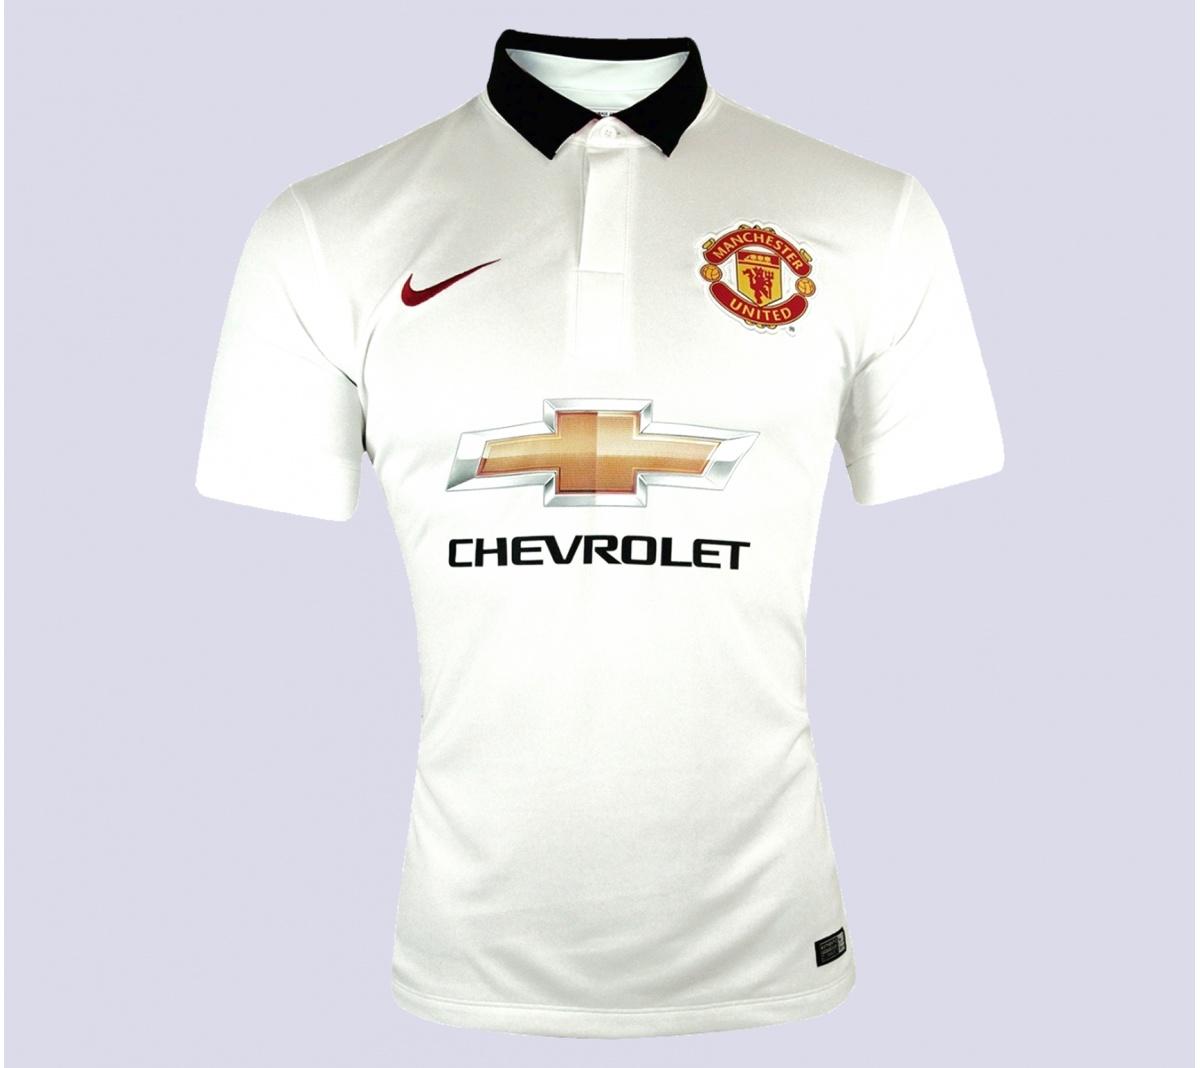 d9a52b3d5b26c Camisa Manchester United II Rooney - Mundo do Futebol